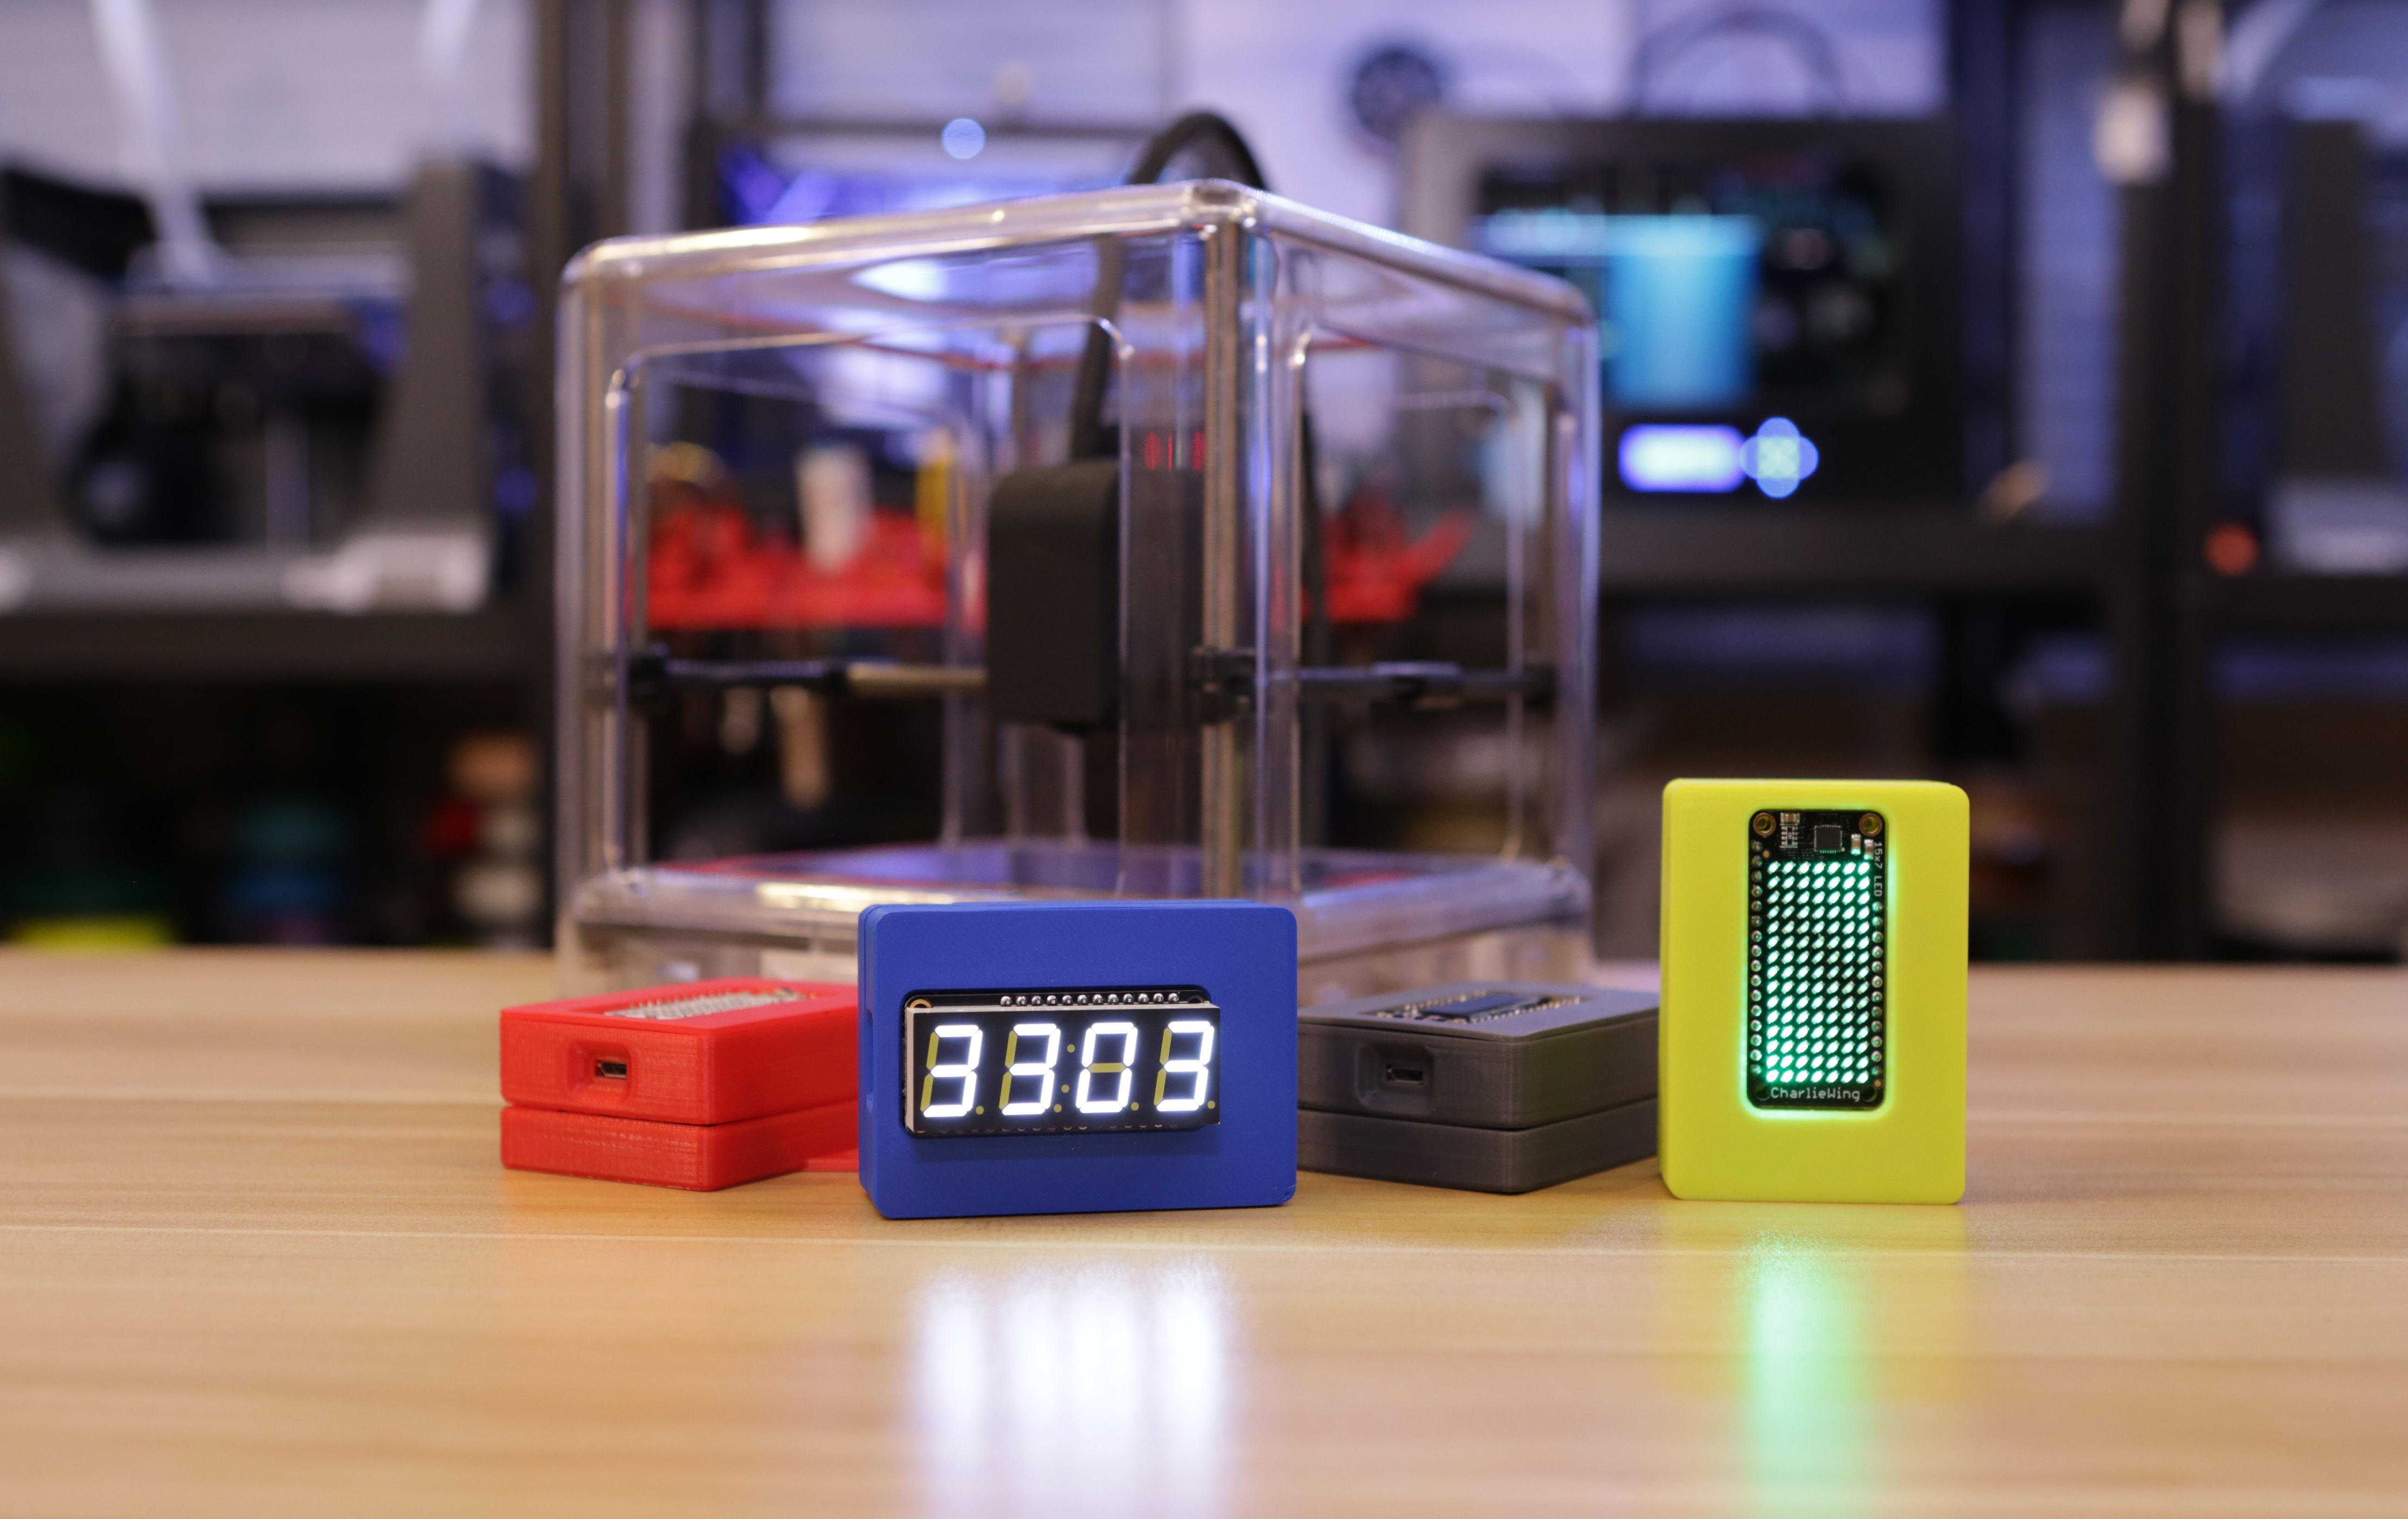 3D Printed Adafruit Feather Box Enclosure by Adafruit | Pinshape